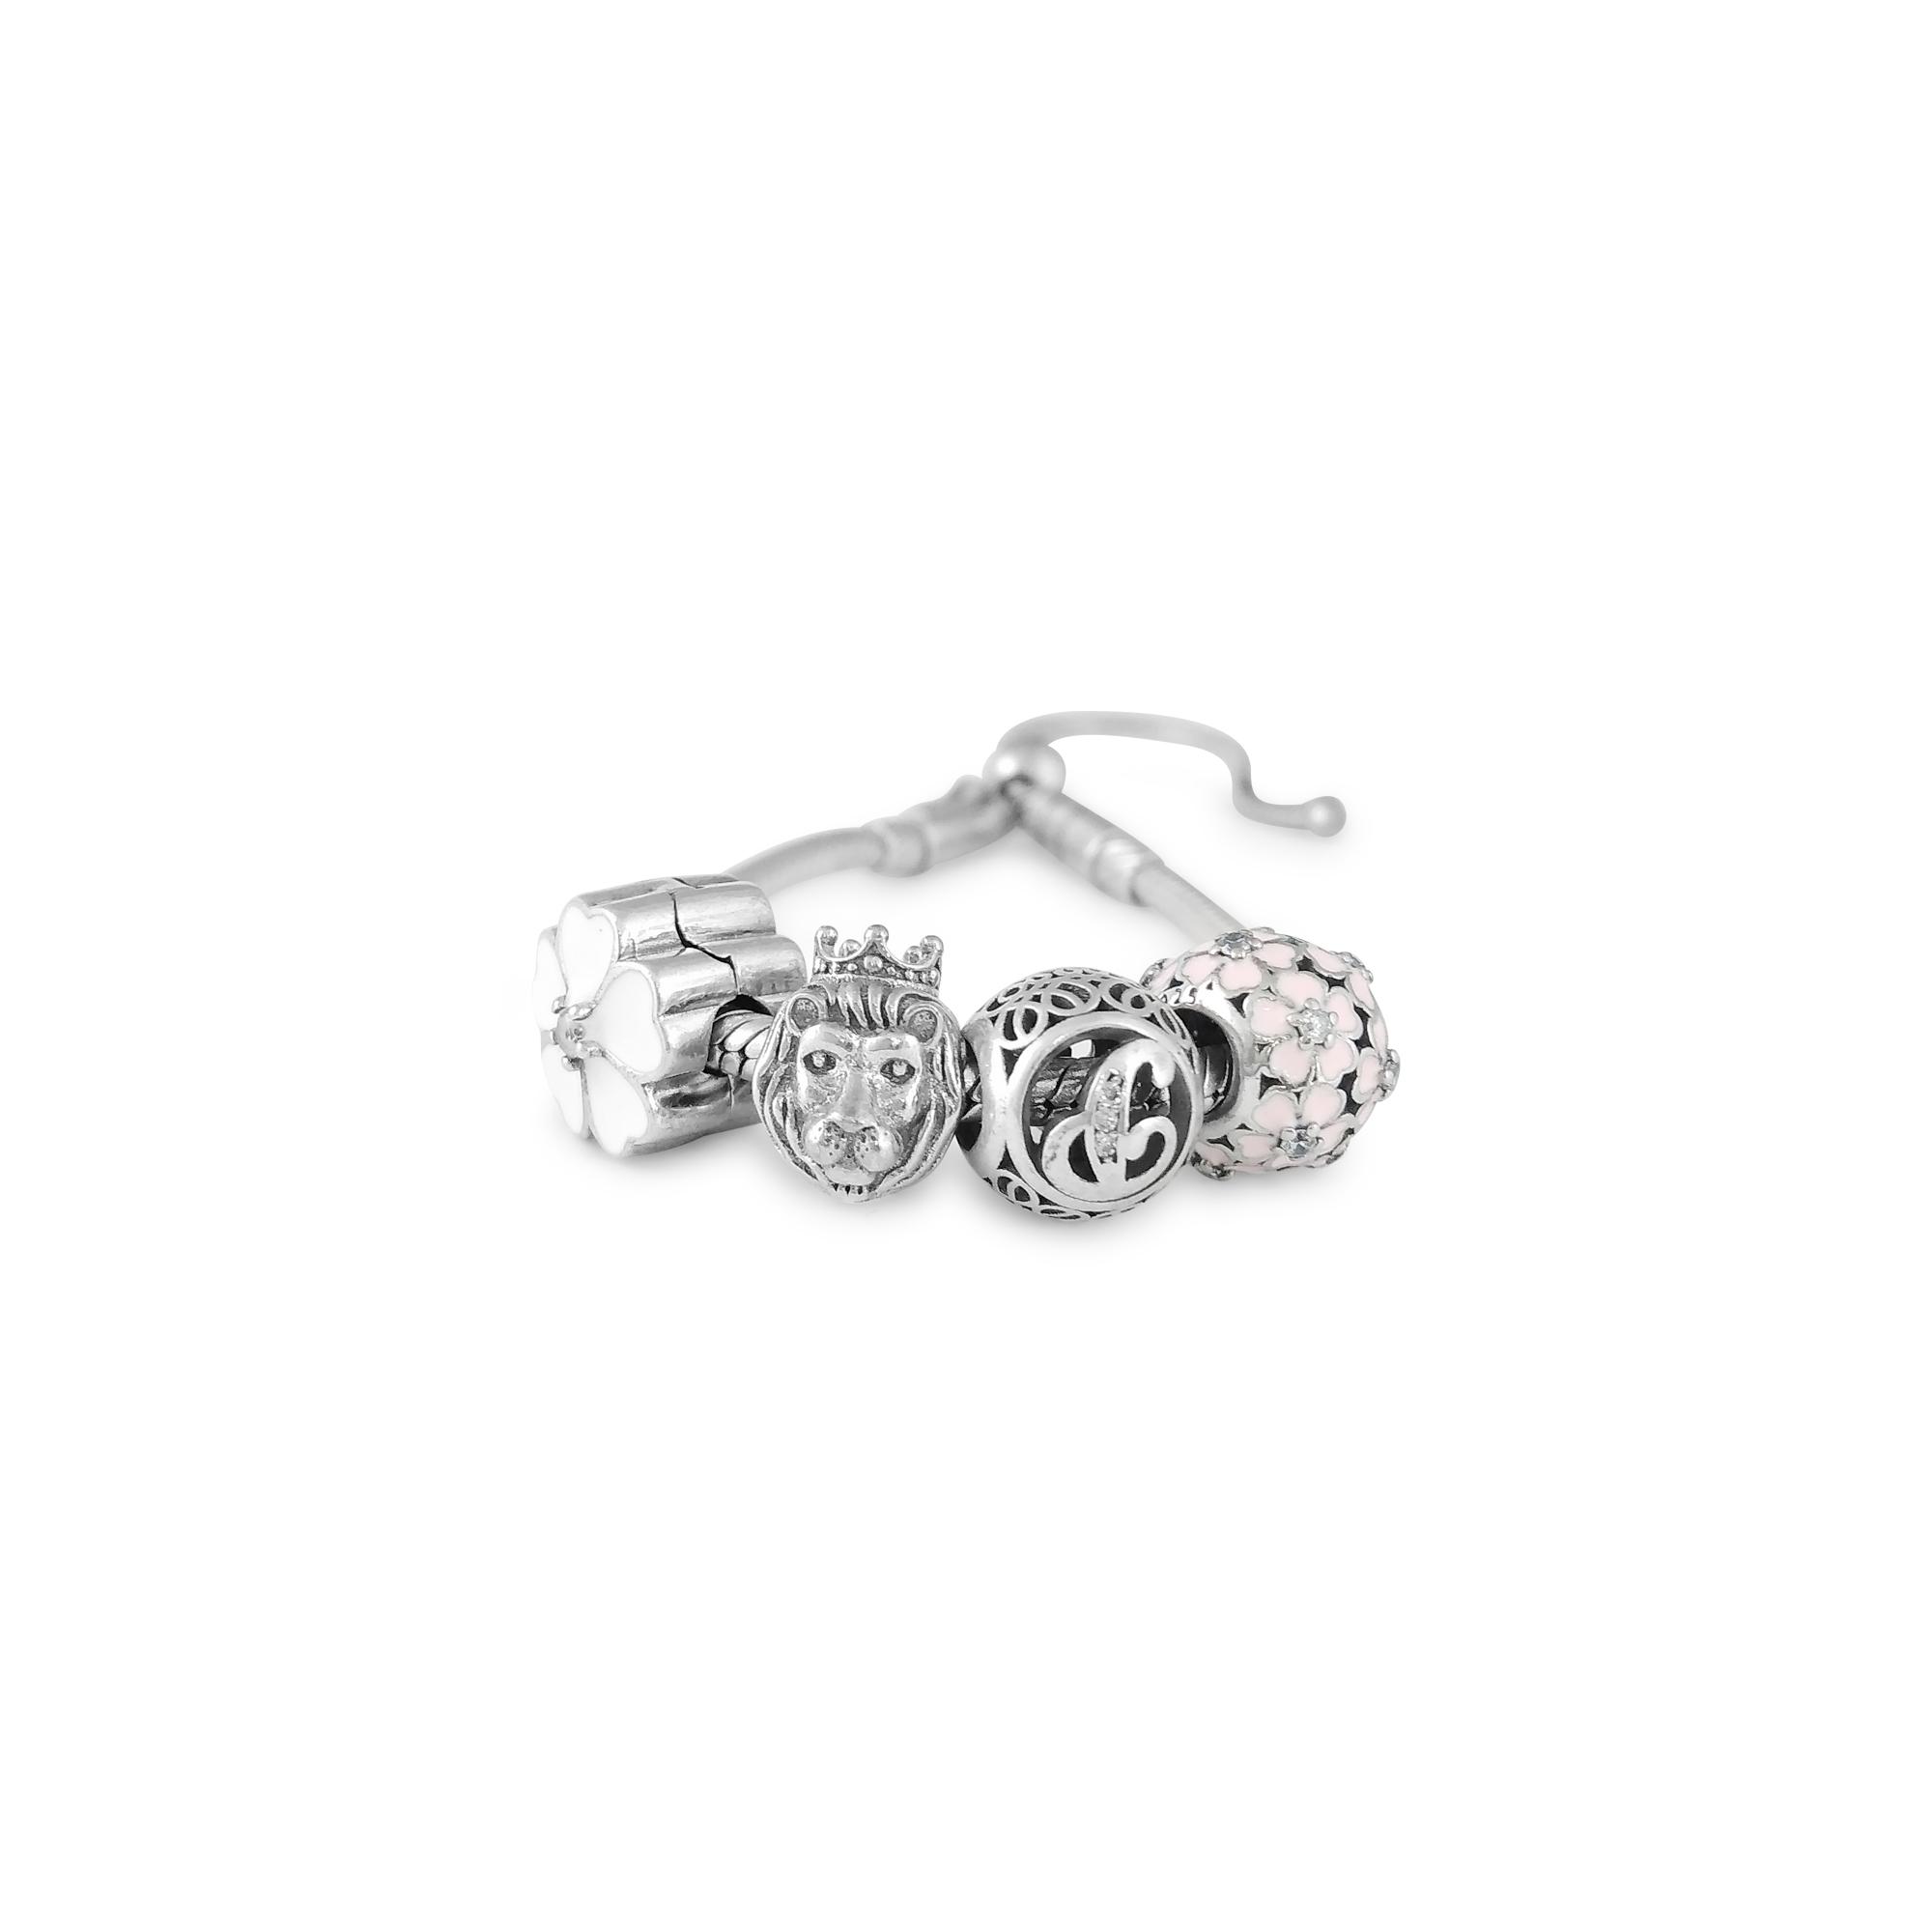 Floral Charm Bracelets